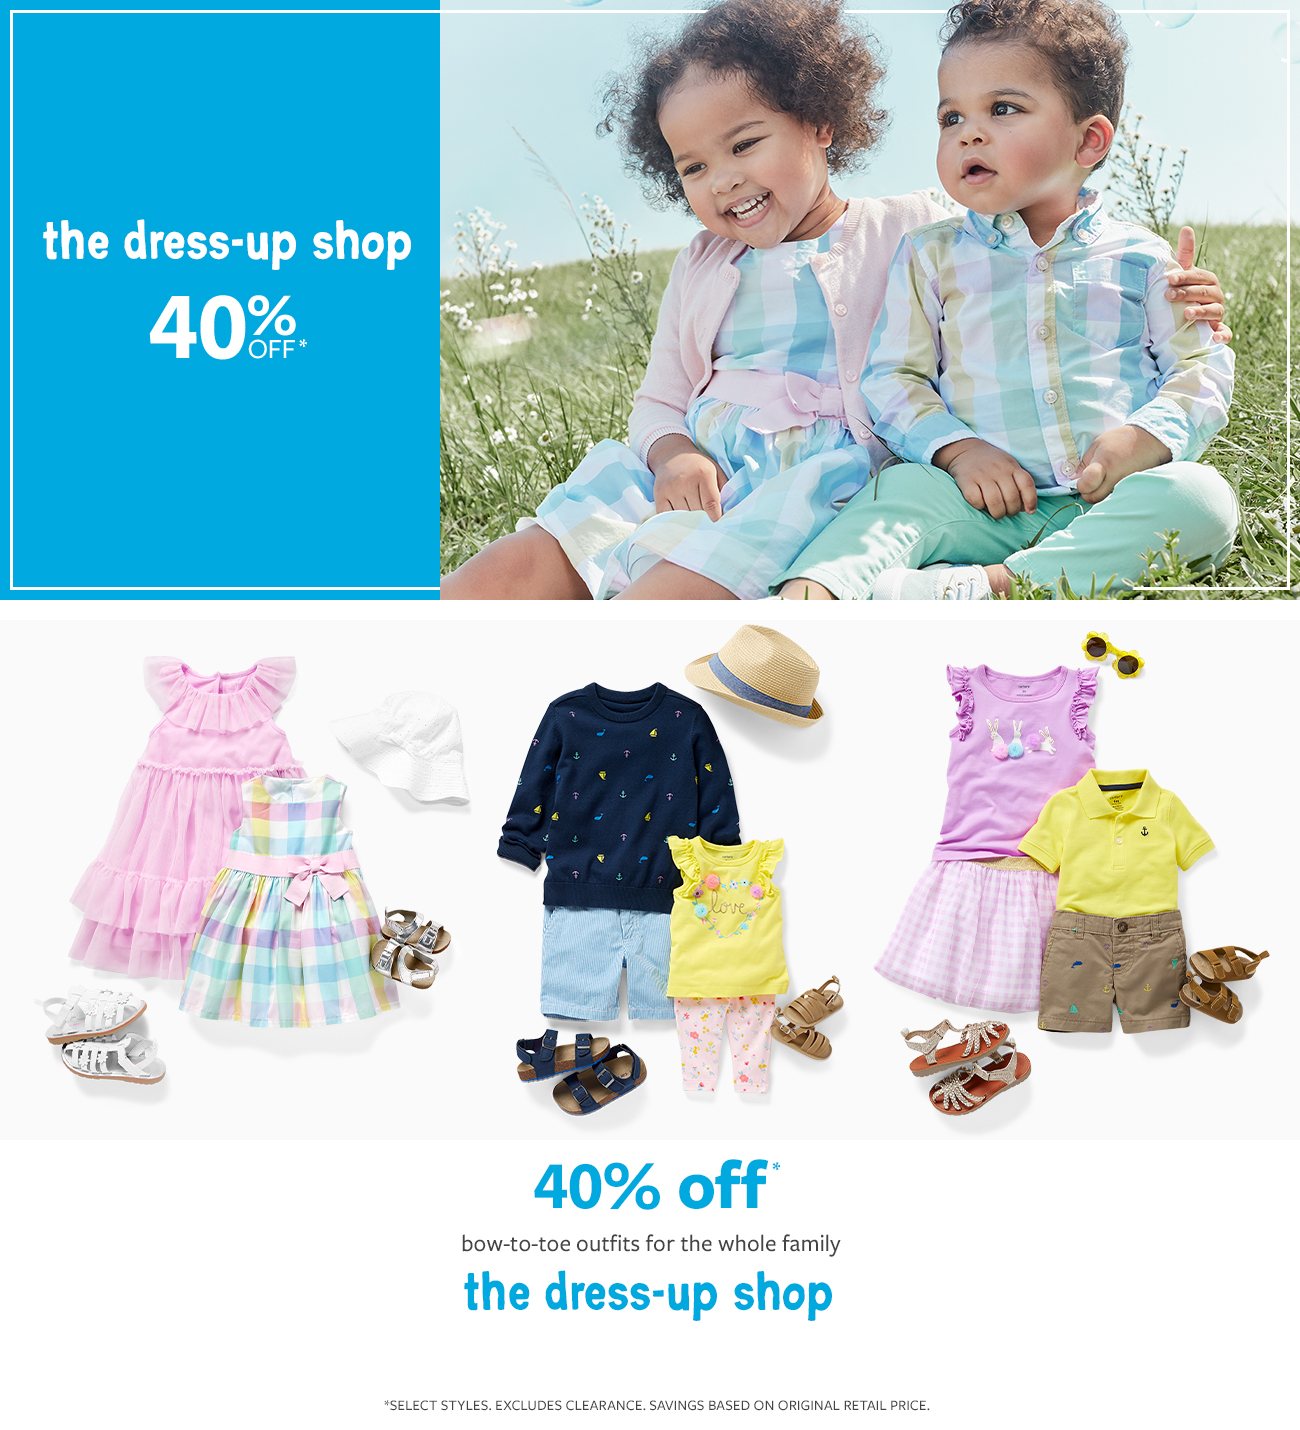 the dress-up shop 40% off